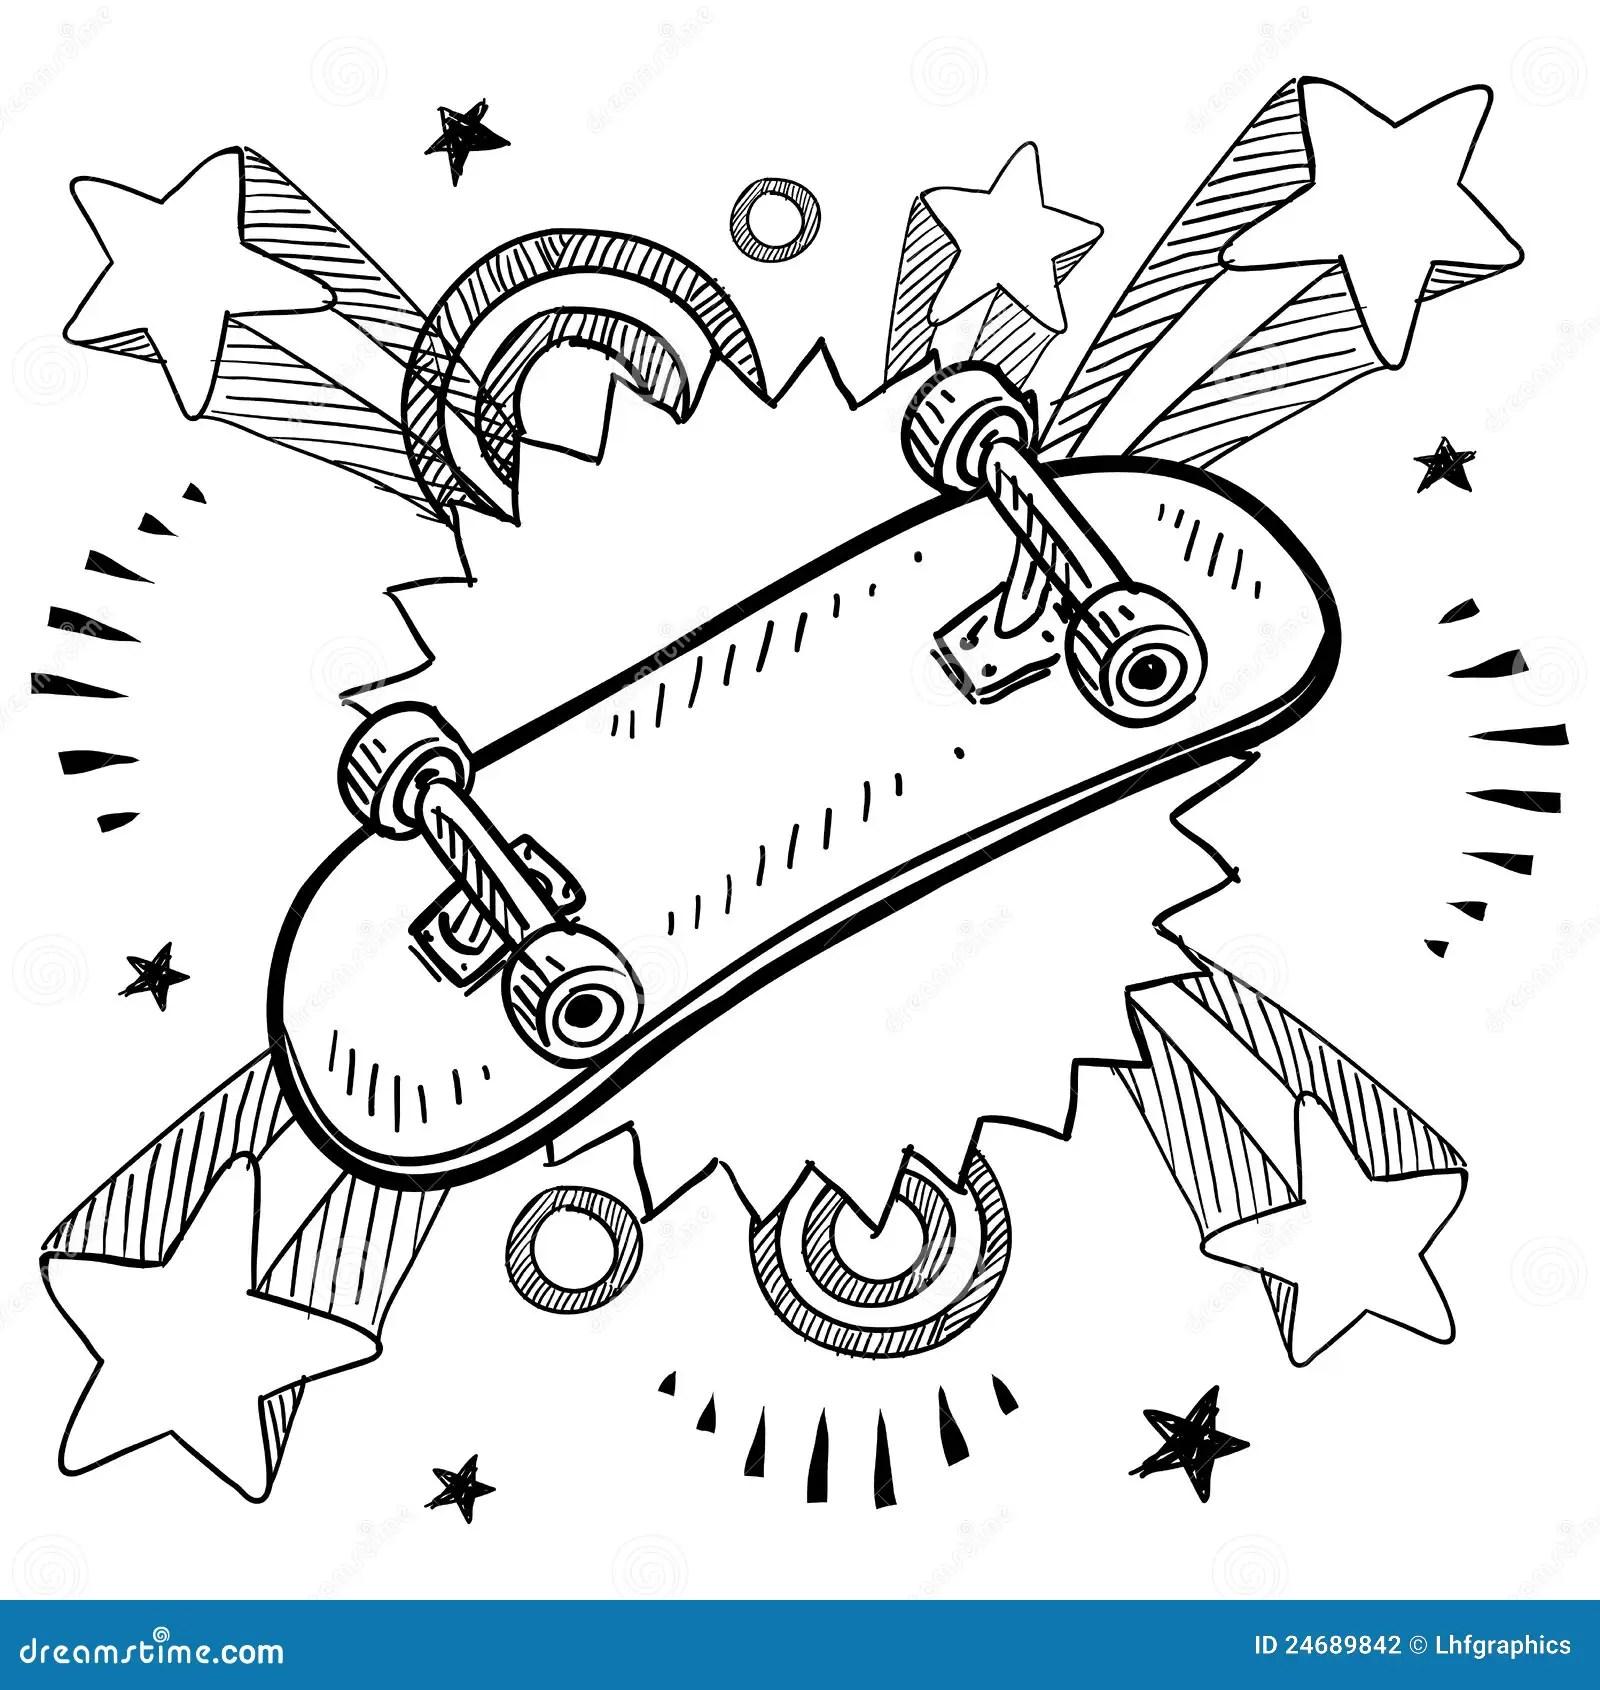 Skateboard Sketch Stock Vector Illustration Of Safety